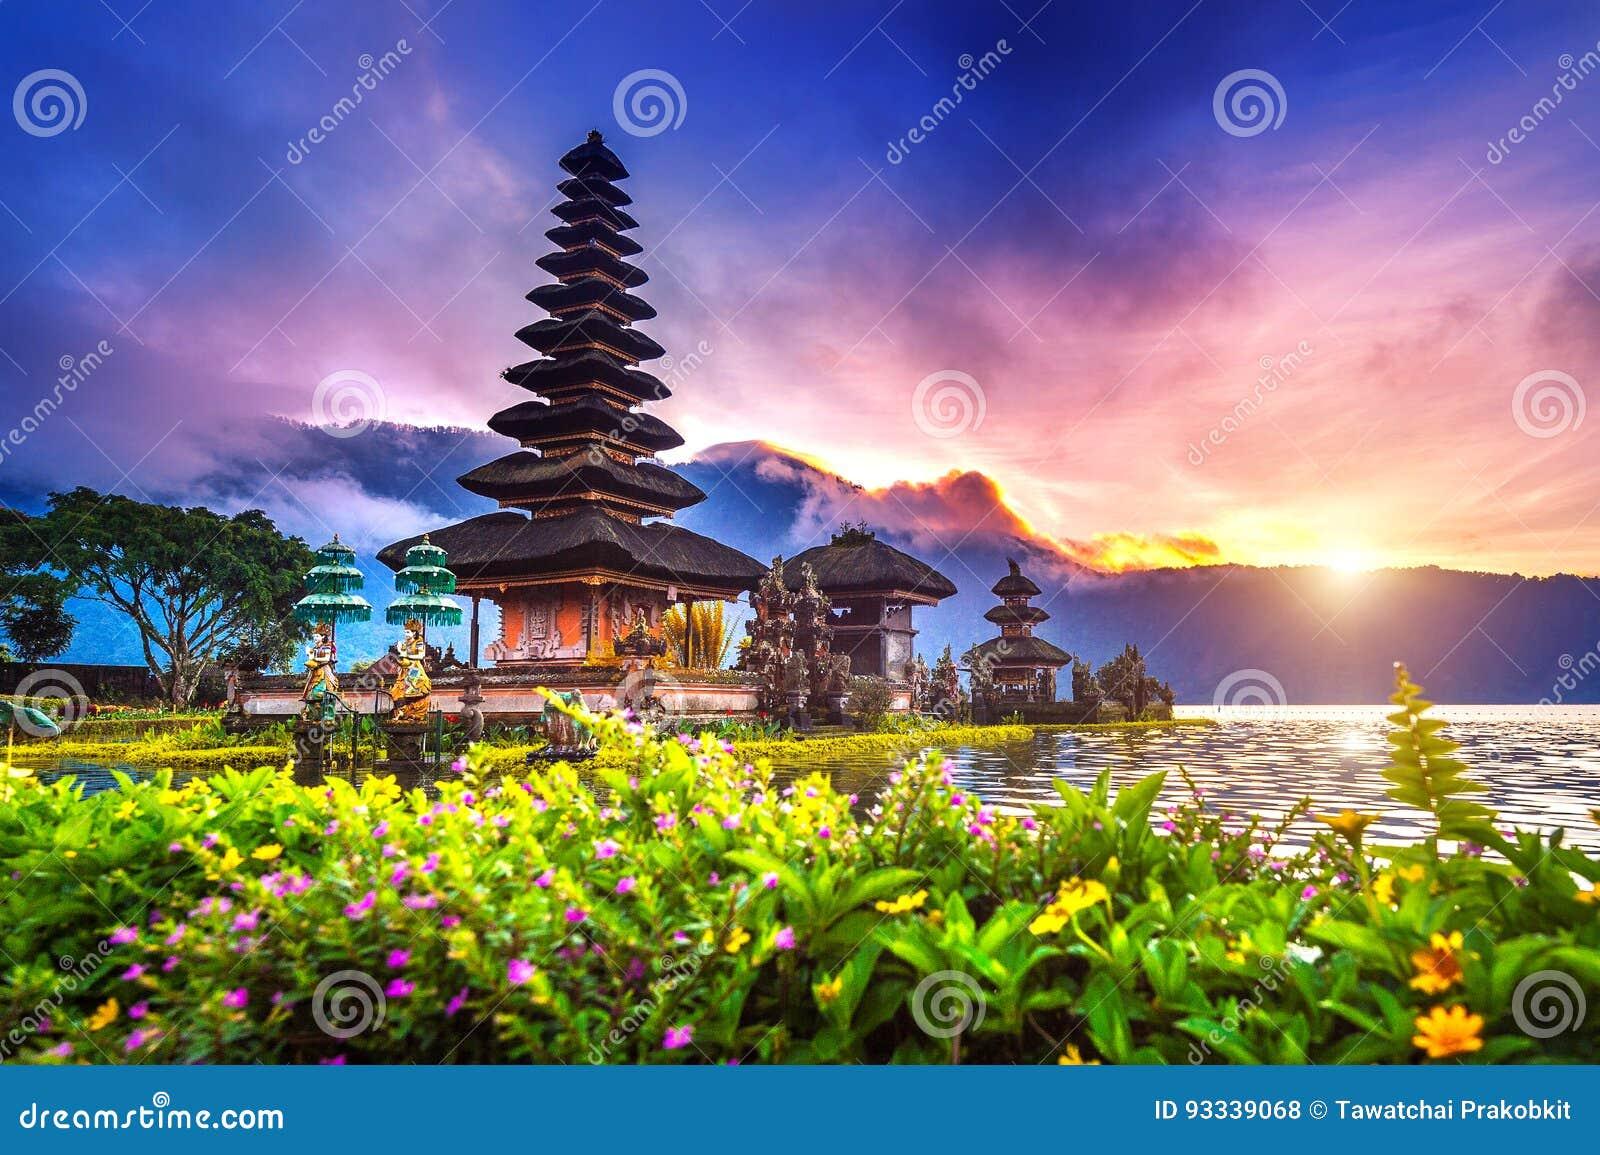 Templo bratan del danu del ulun de Pura en Bali